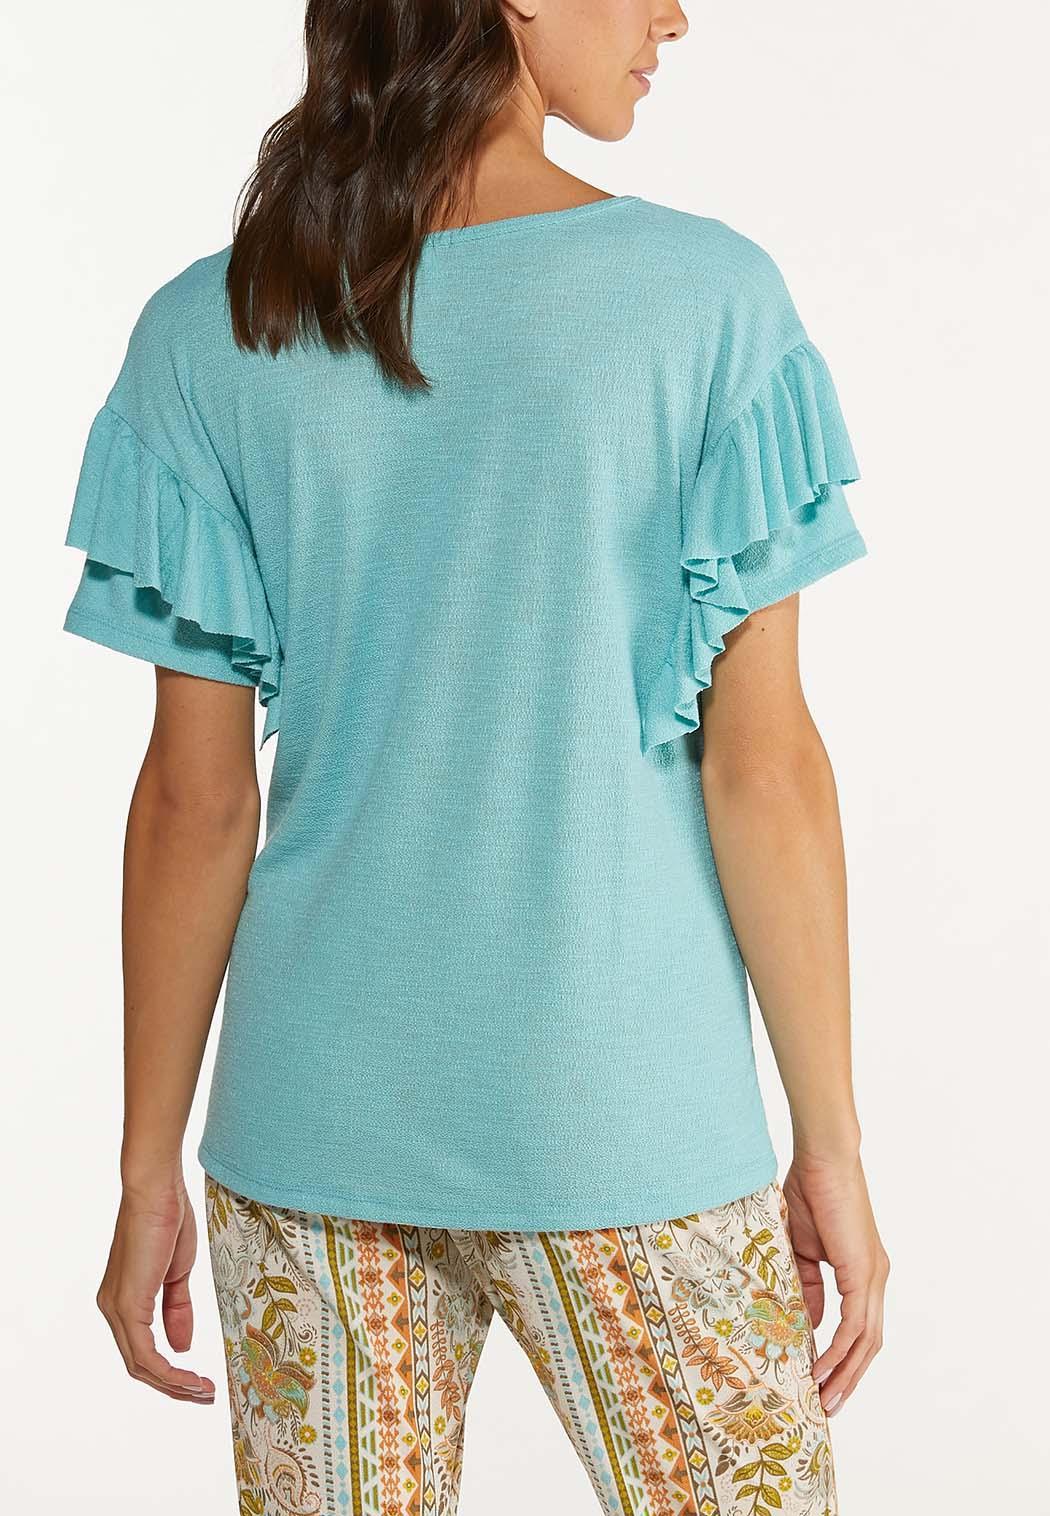 Ruffled Stud Embellished Top (Item #44640878)